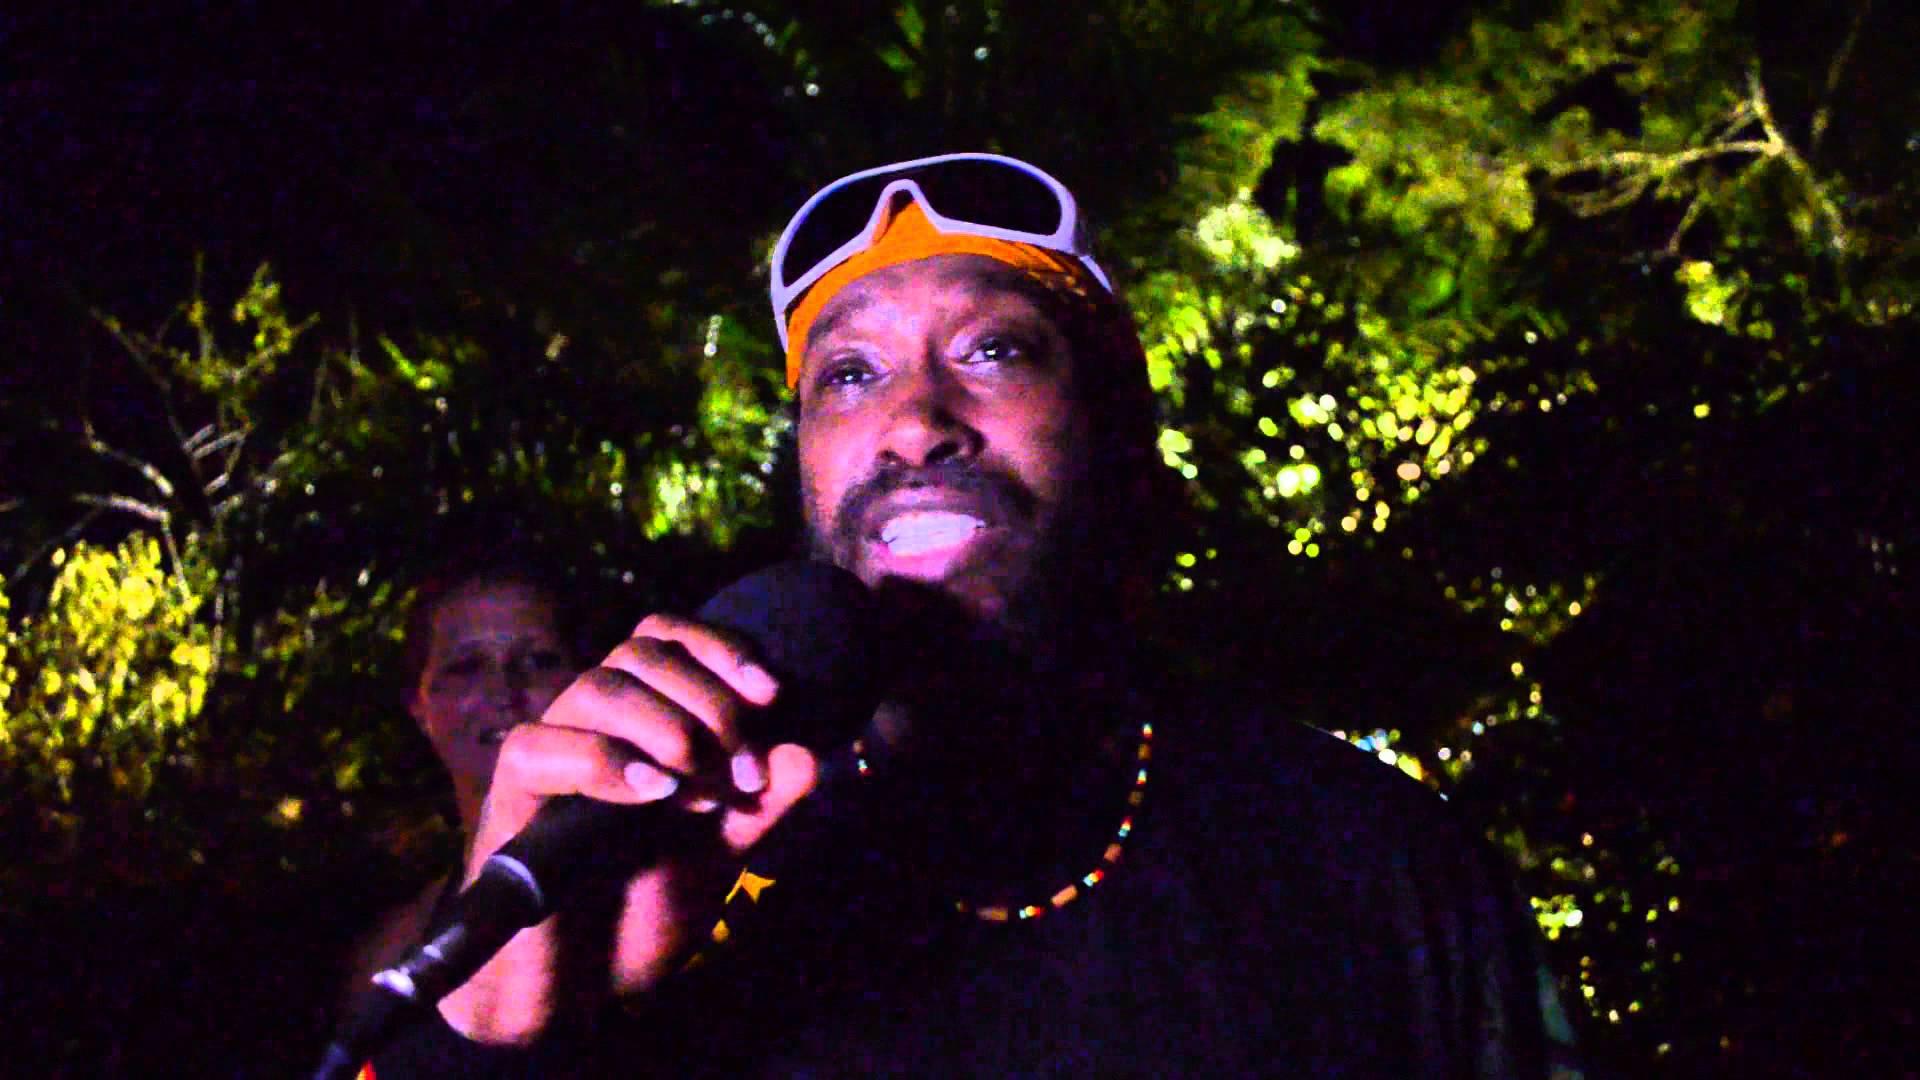 Interview with Amlak Tafari of Steel Pulse @ Jungle Jam in Costa Rica [3/22/2015]